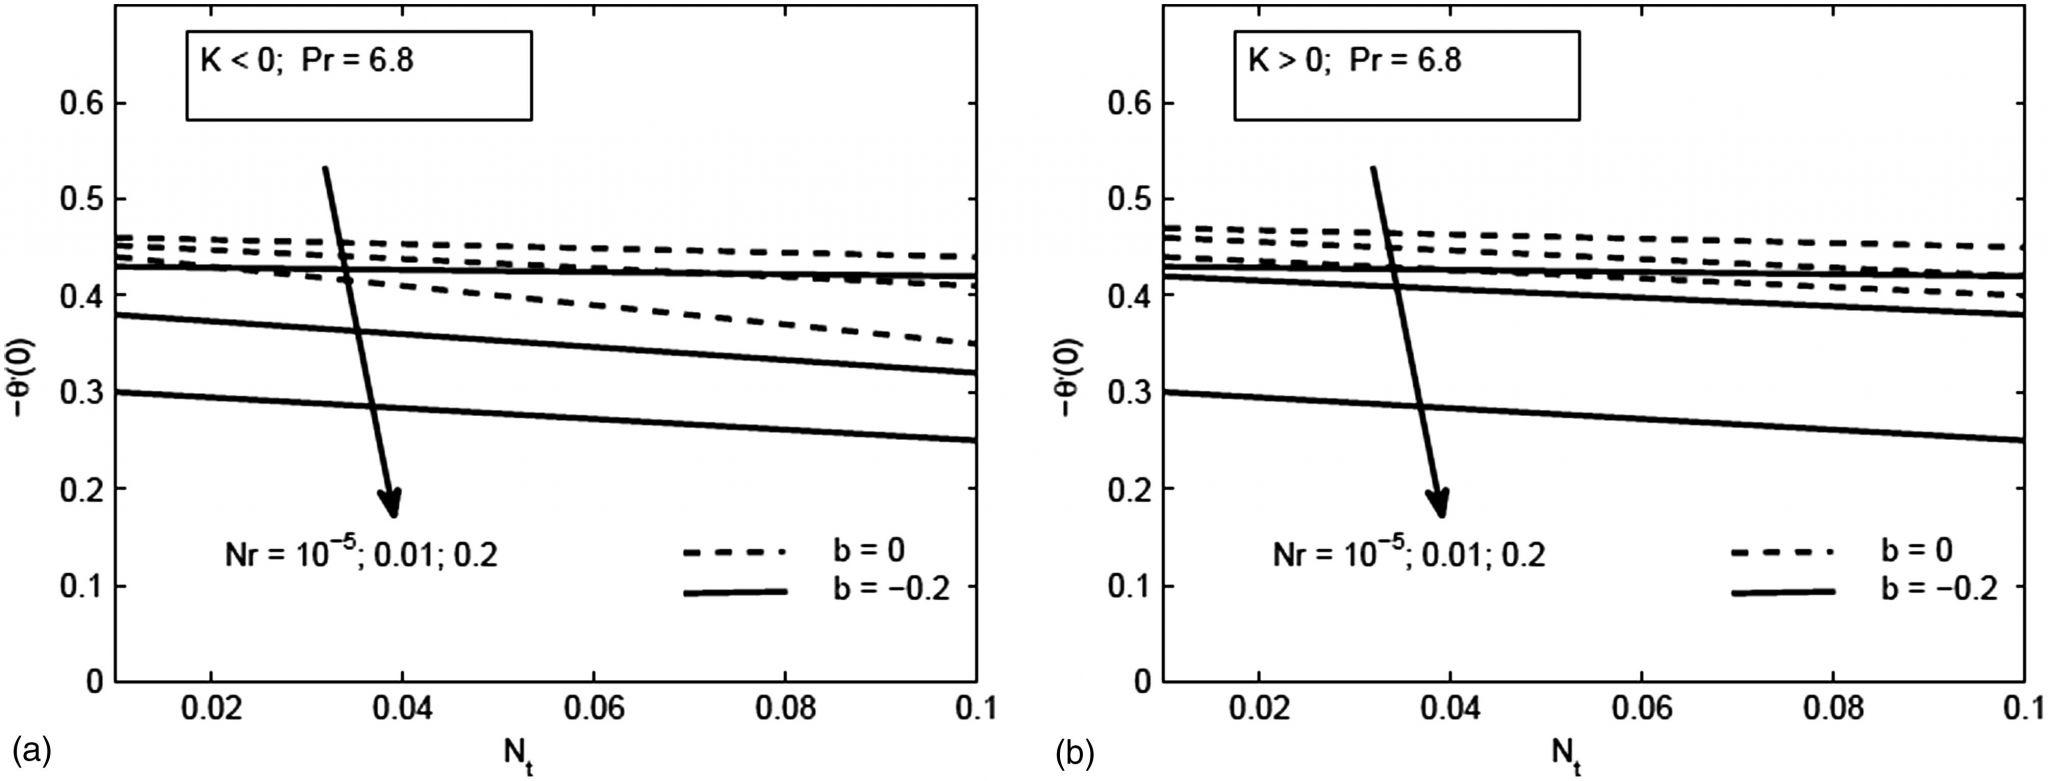 Methods Of Heat Transfer Worksheet Answers